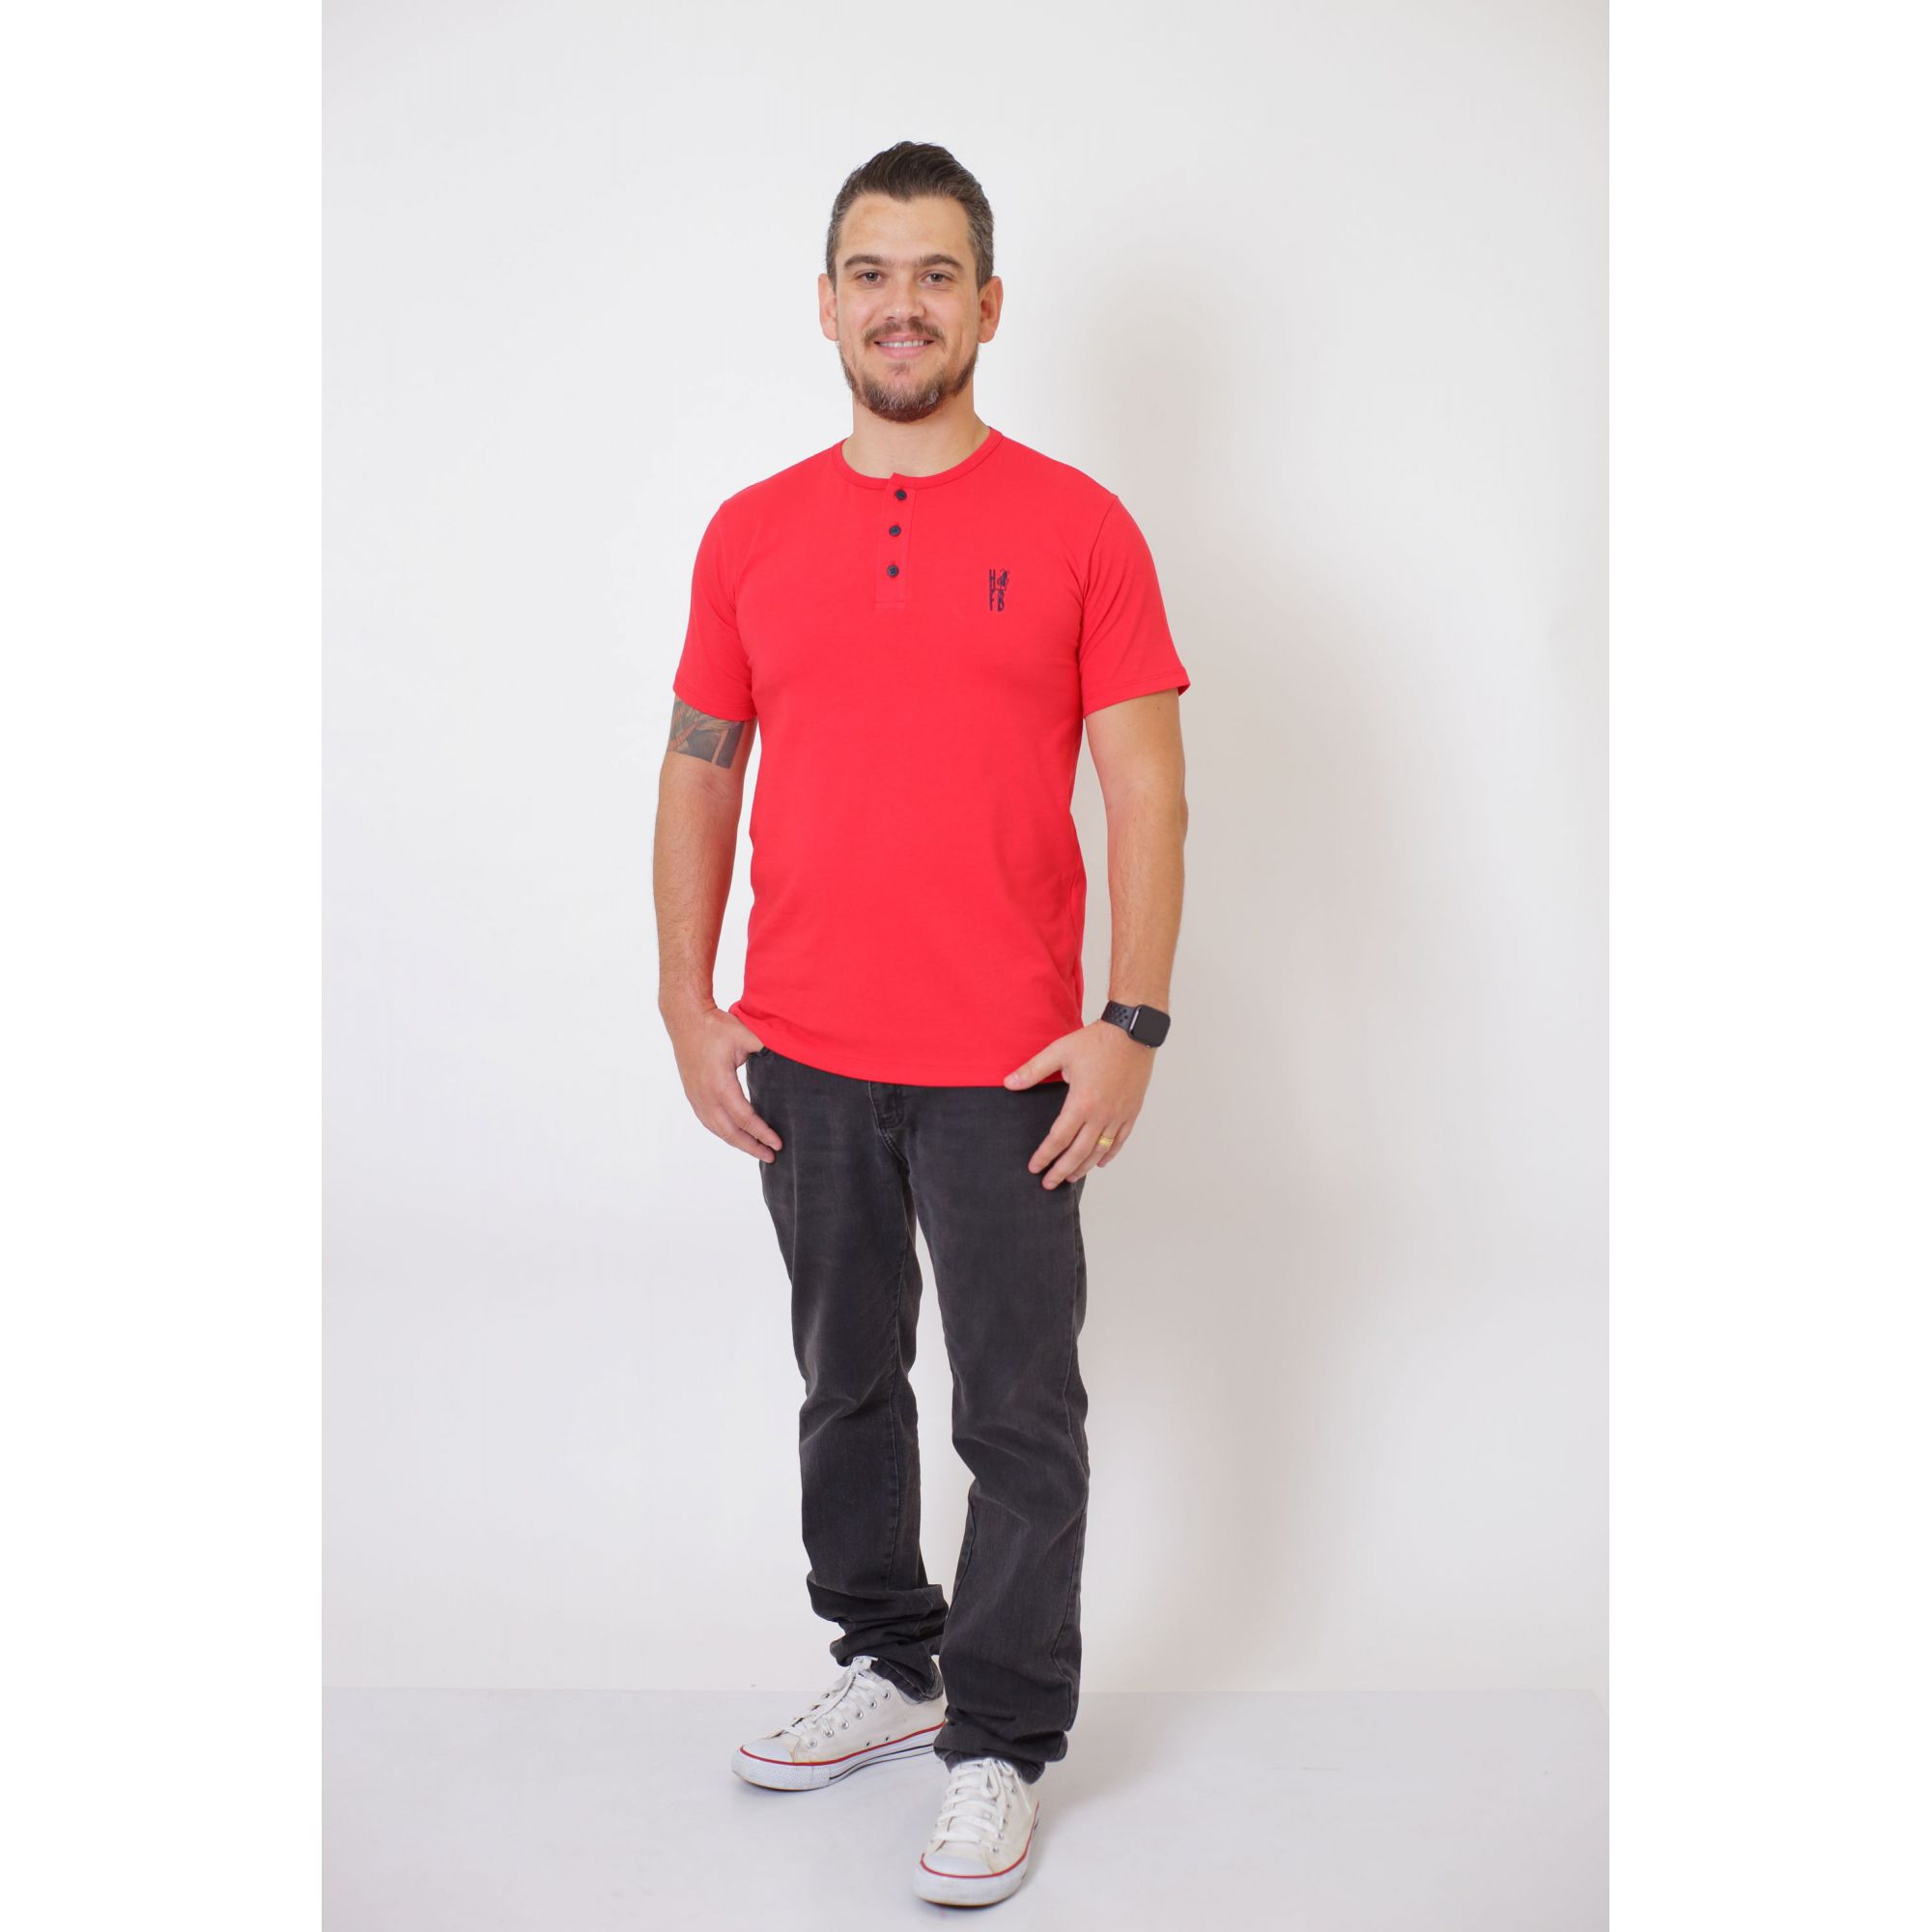 T-Shirt Henley Masculina Vermelha  - Heitor Fashion Brazil